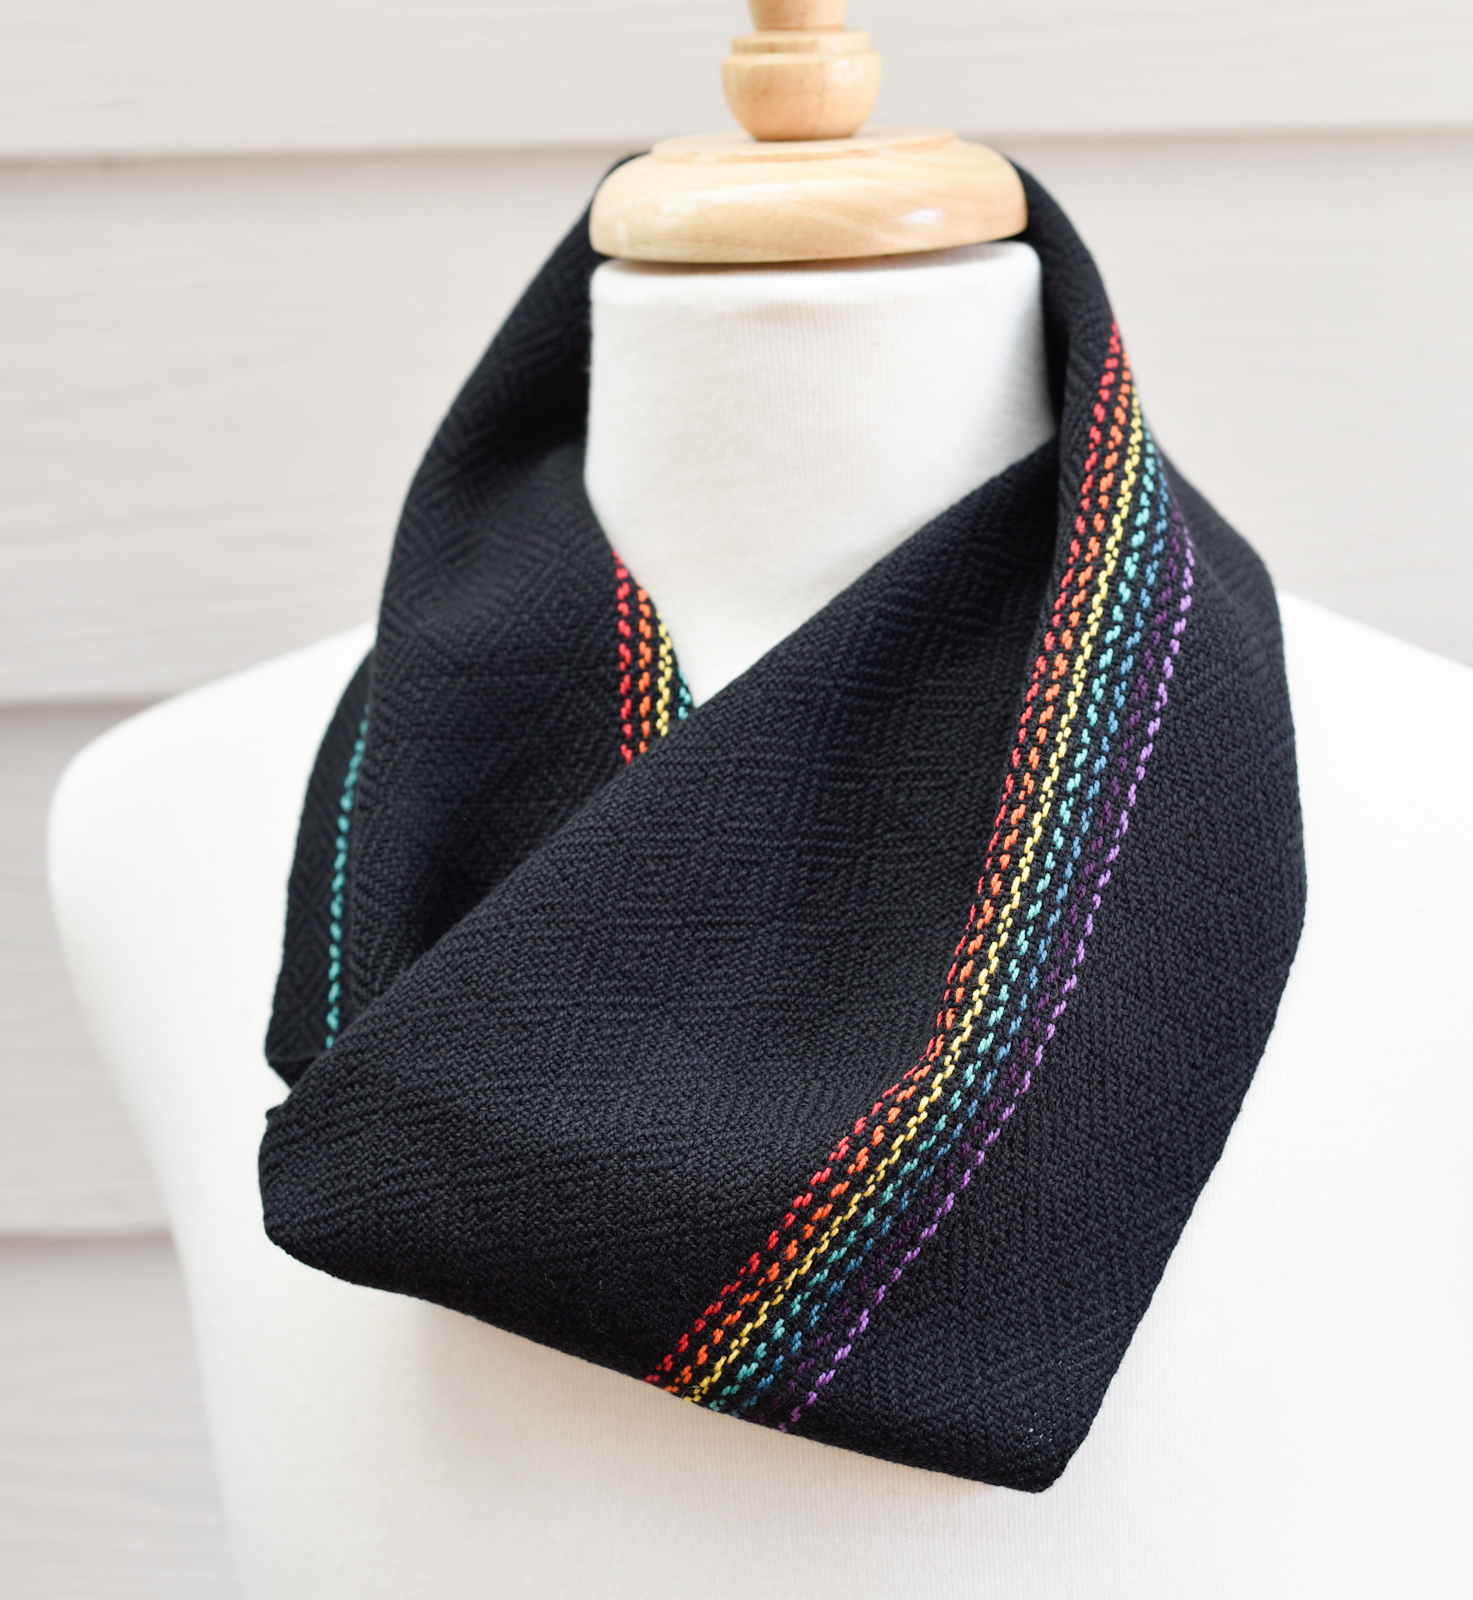 HandwovenCottonScarf_LGBTQCravat1.jpg